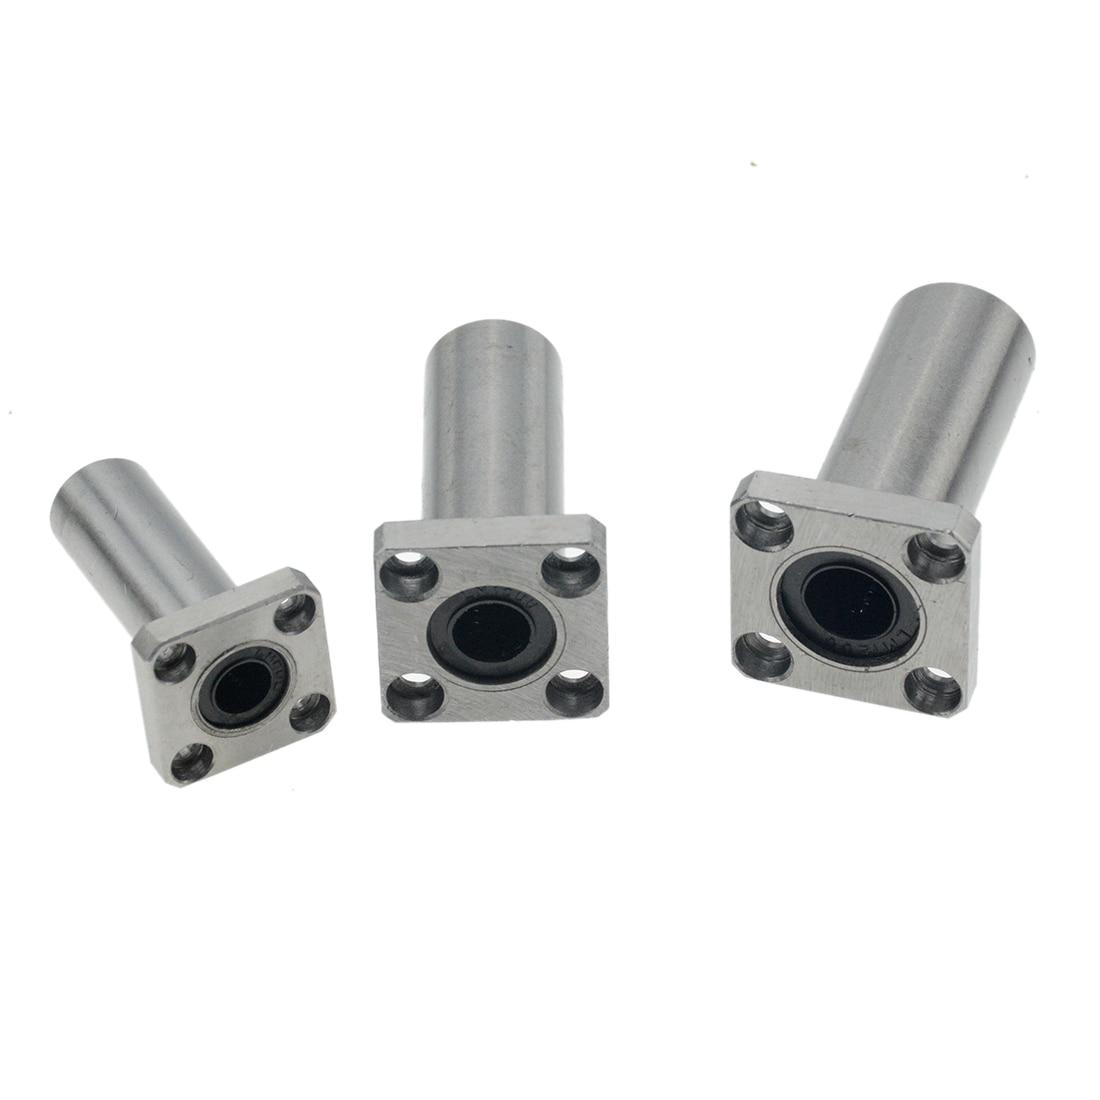 1pc LMK10LUU LMK10UU LMK8UU LMK12UU LMK16UU LMK6UU LMK20UU LMK12LUU Type 10mm Flange Linear Bearing For 3D Printer Linear Rod